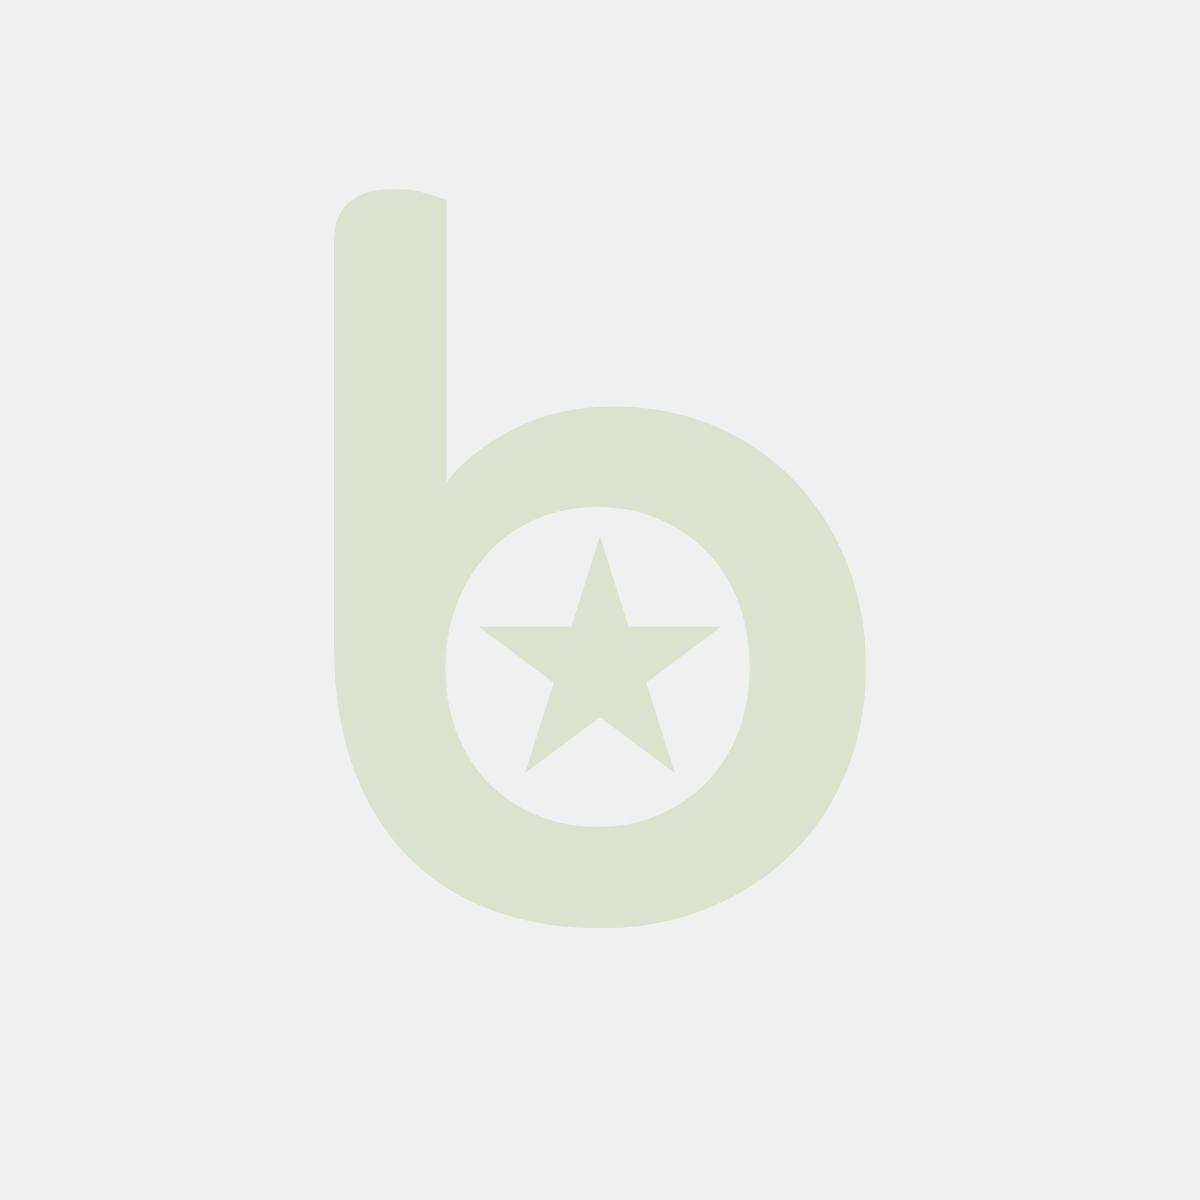 Ramka, matryca do tacek MANUPACK 178/113 MAP niedziolona - podwójna